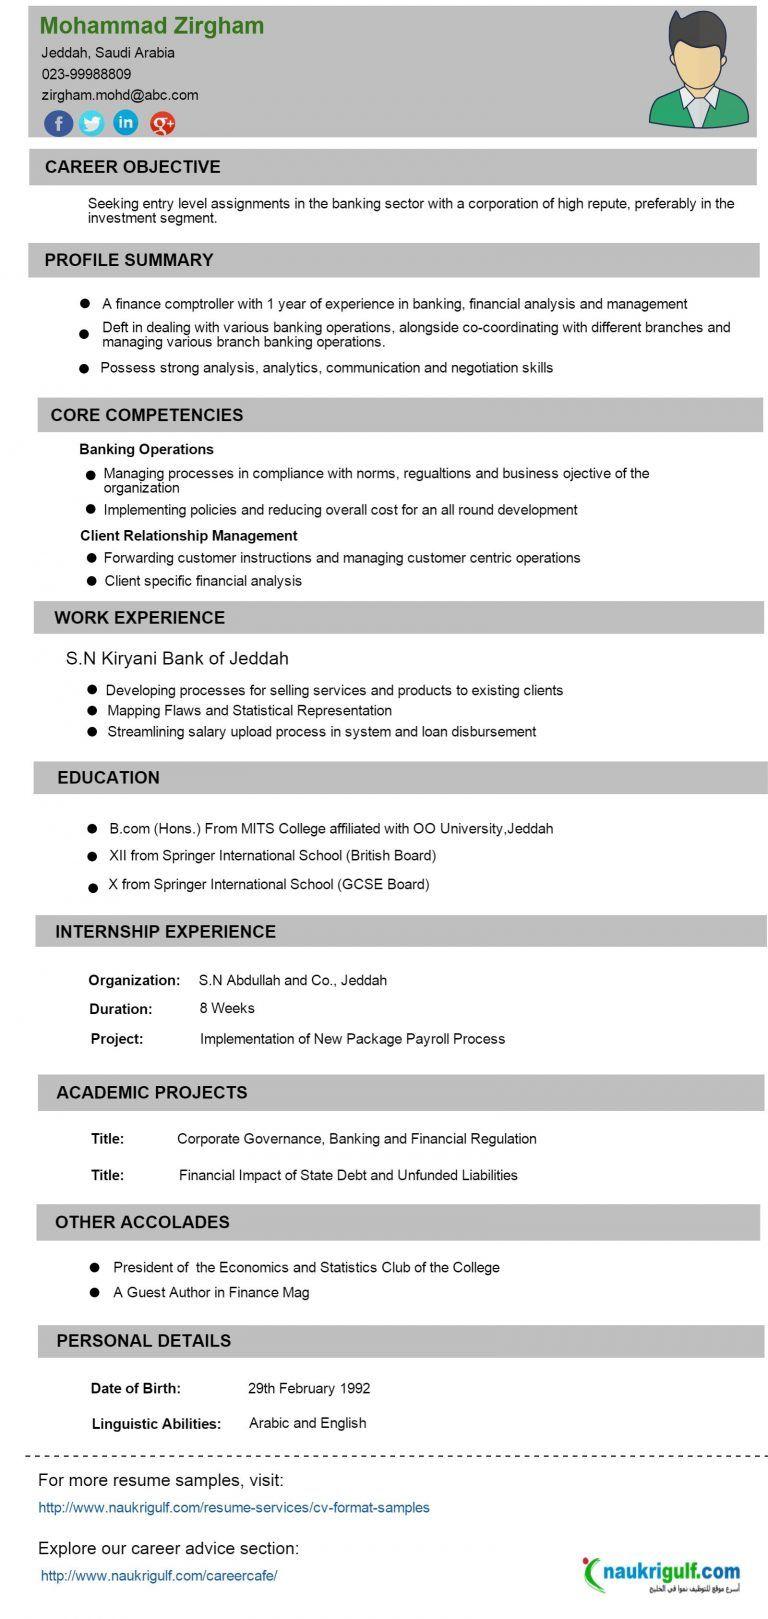 Cv format banking finance resume sample naukriuglf com for